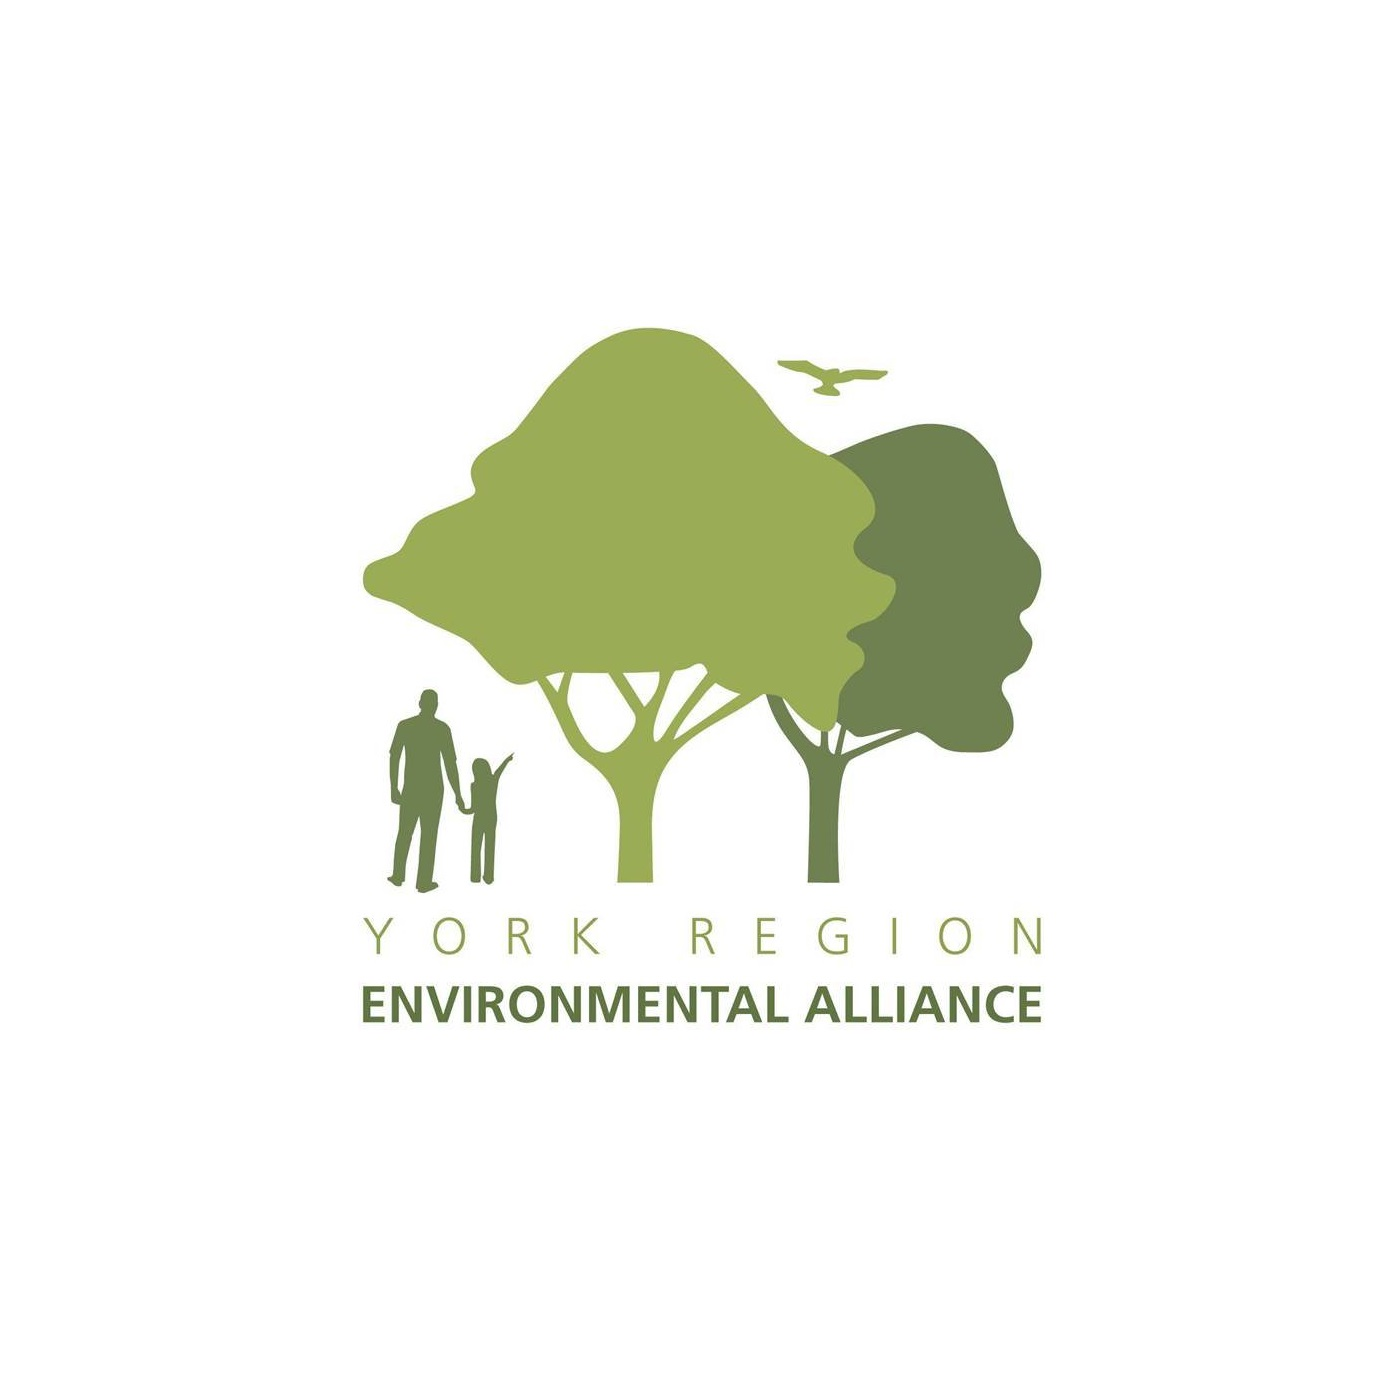 York Region Environmental Alliance logo